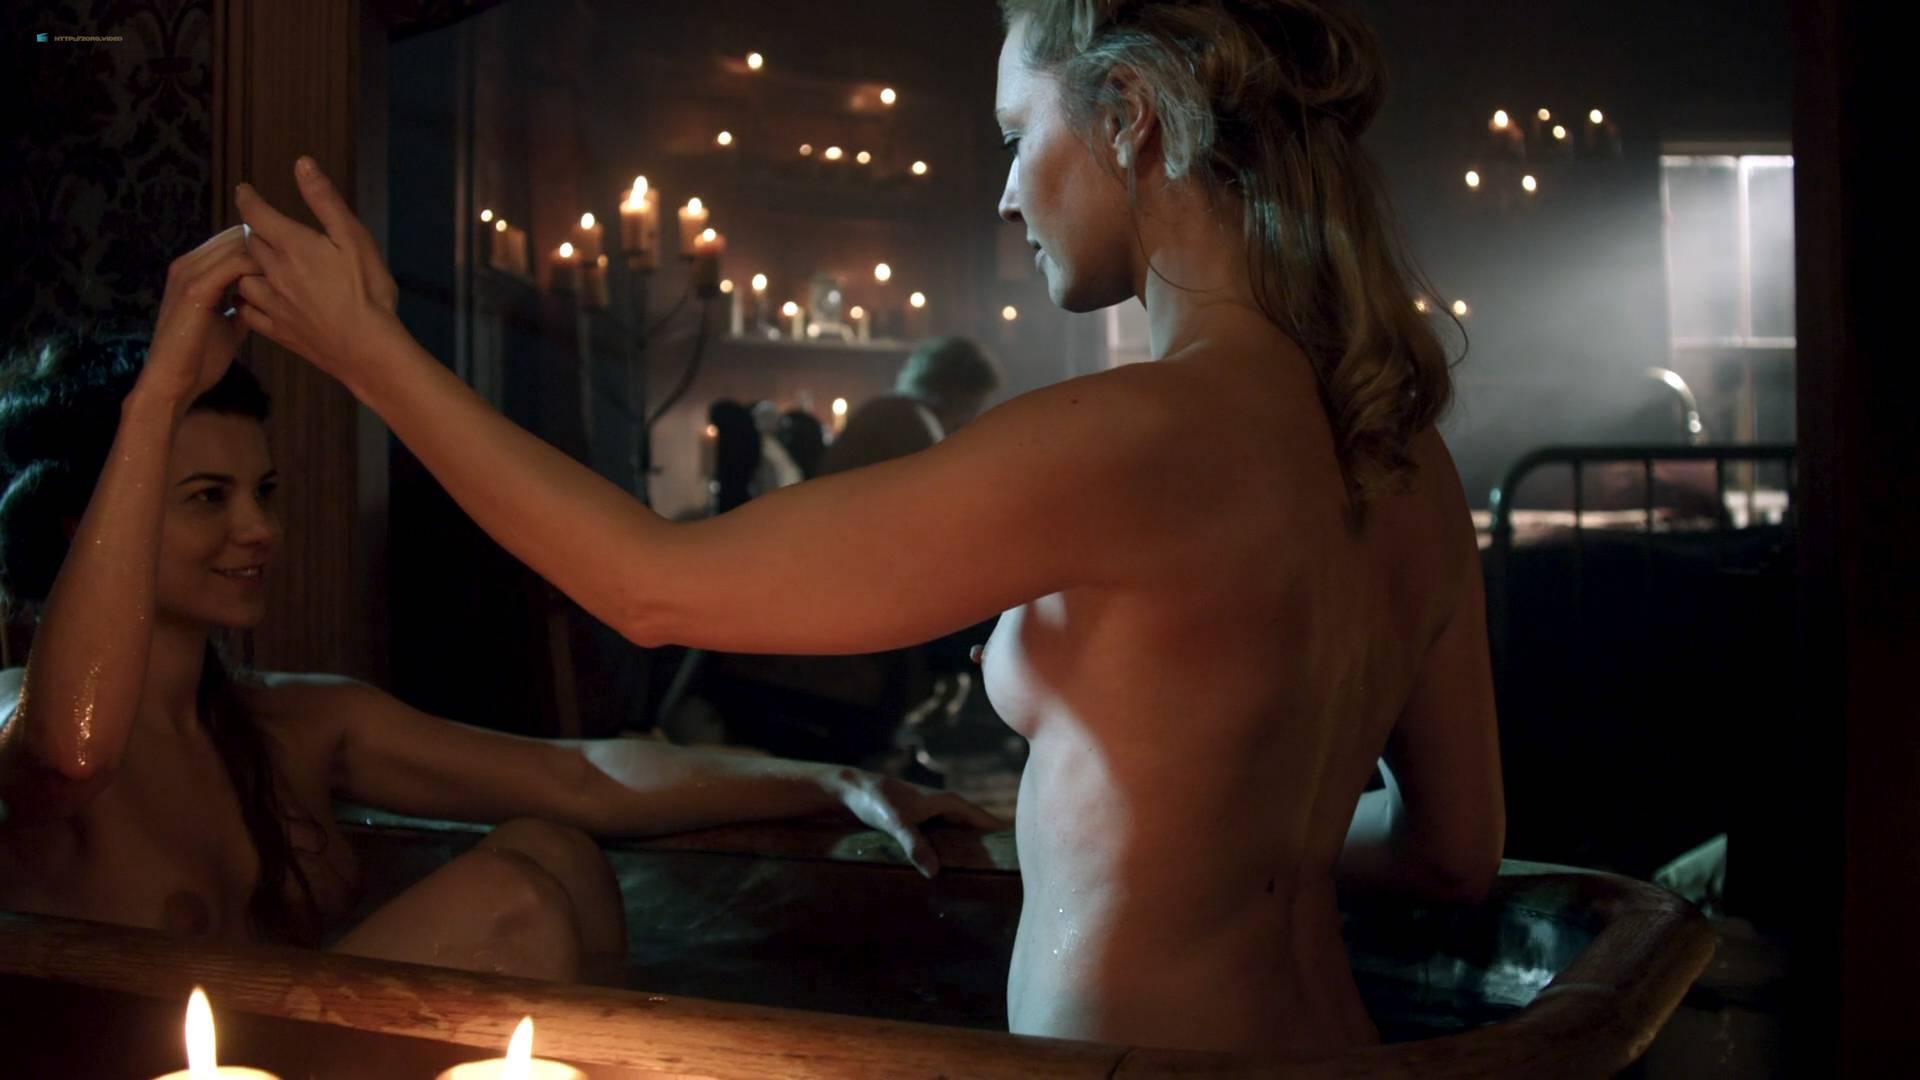 Elizabeth Lavender nude topless Elysia Rotaru nude butt boobs - Dead Again in Tombstone (2017) HD 1080p BluRay (7)